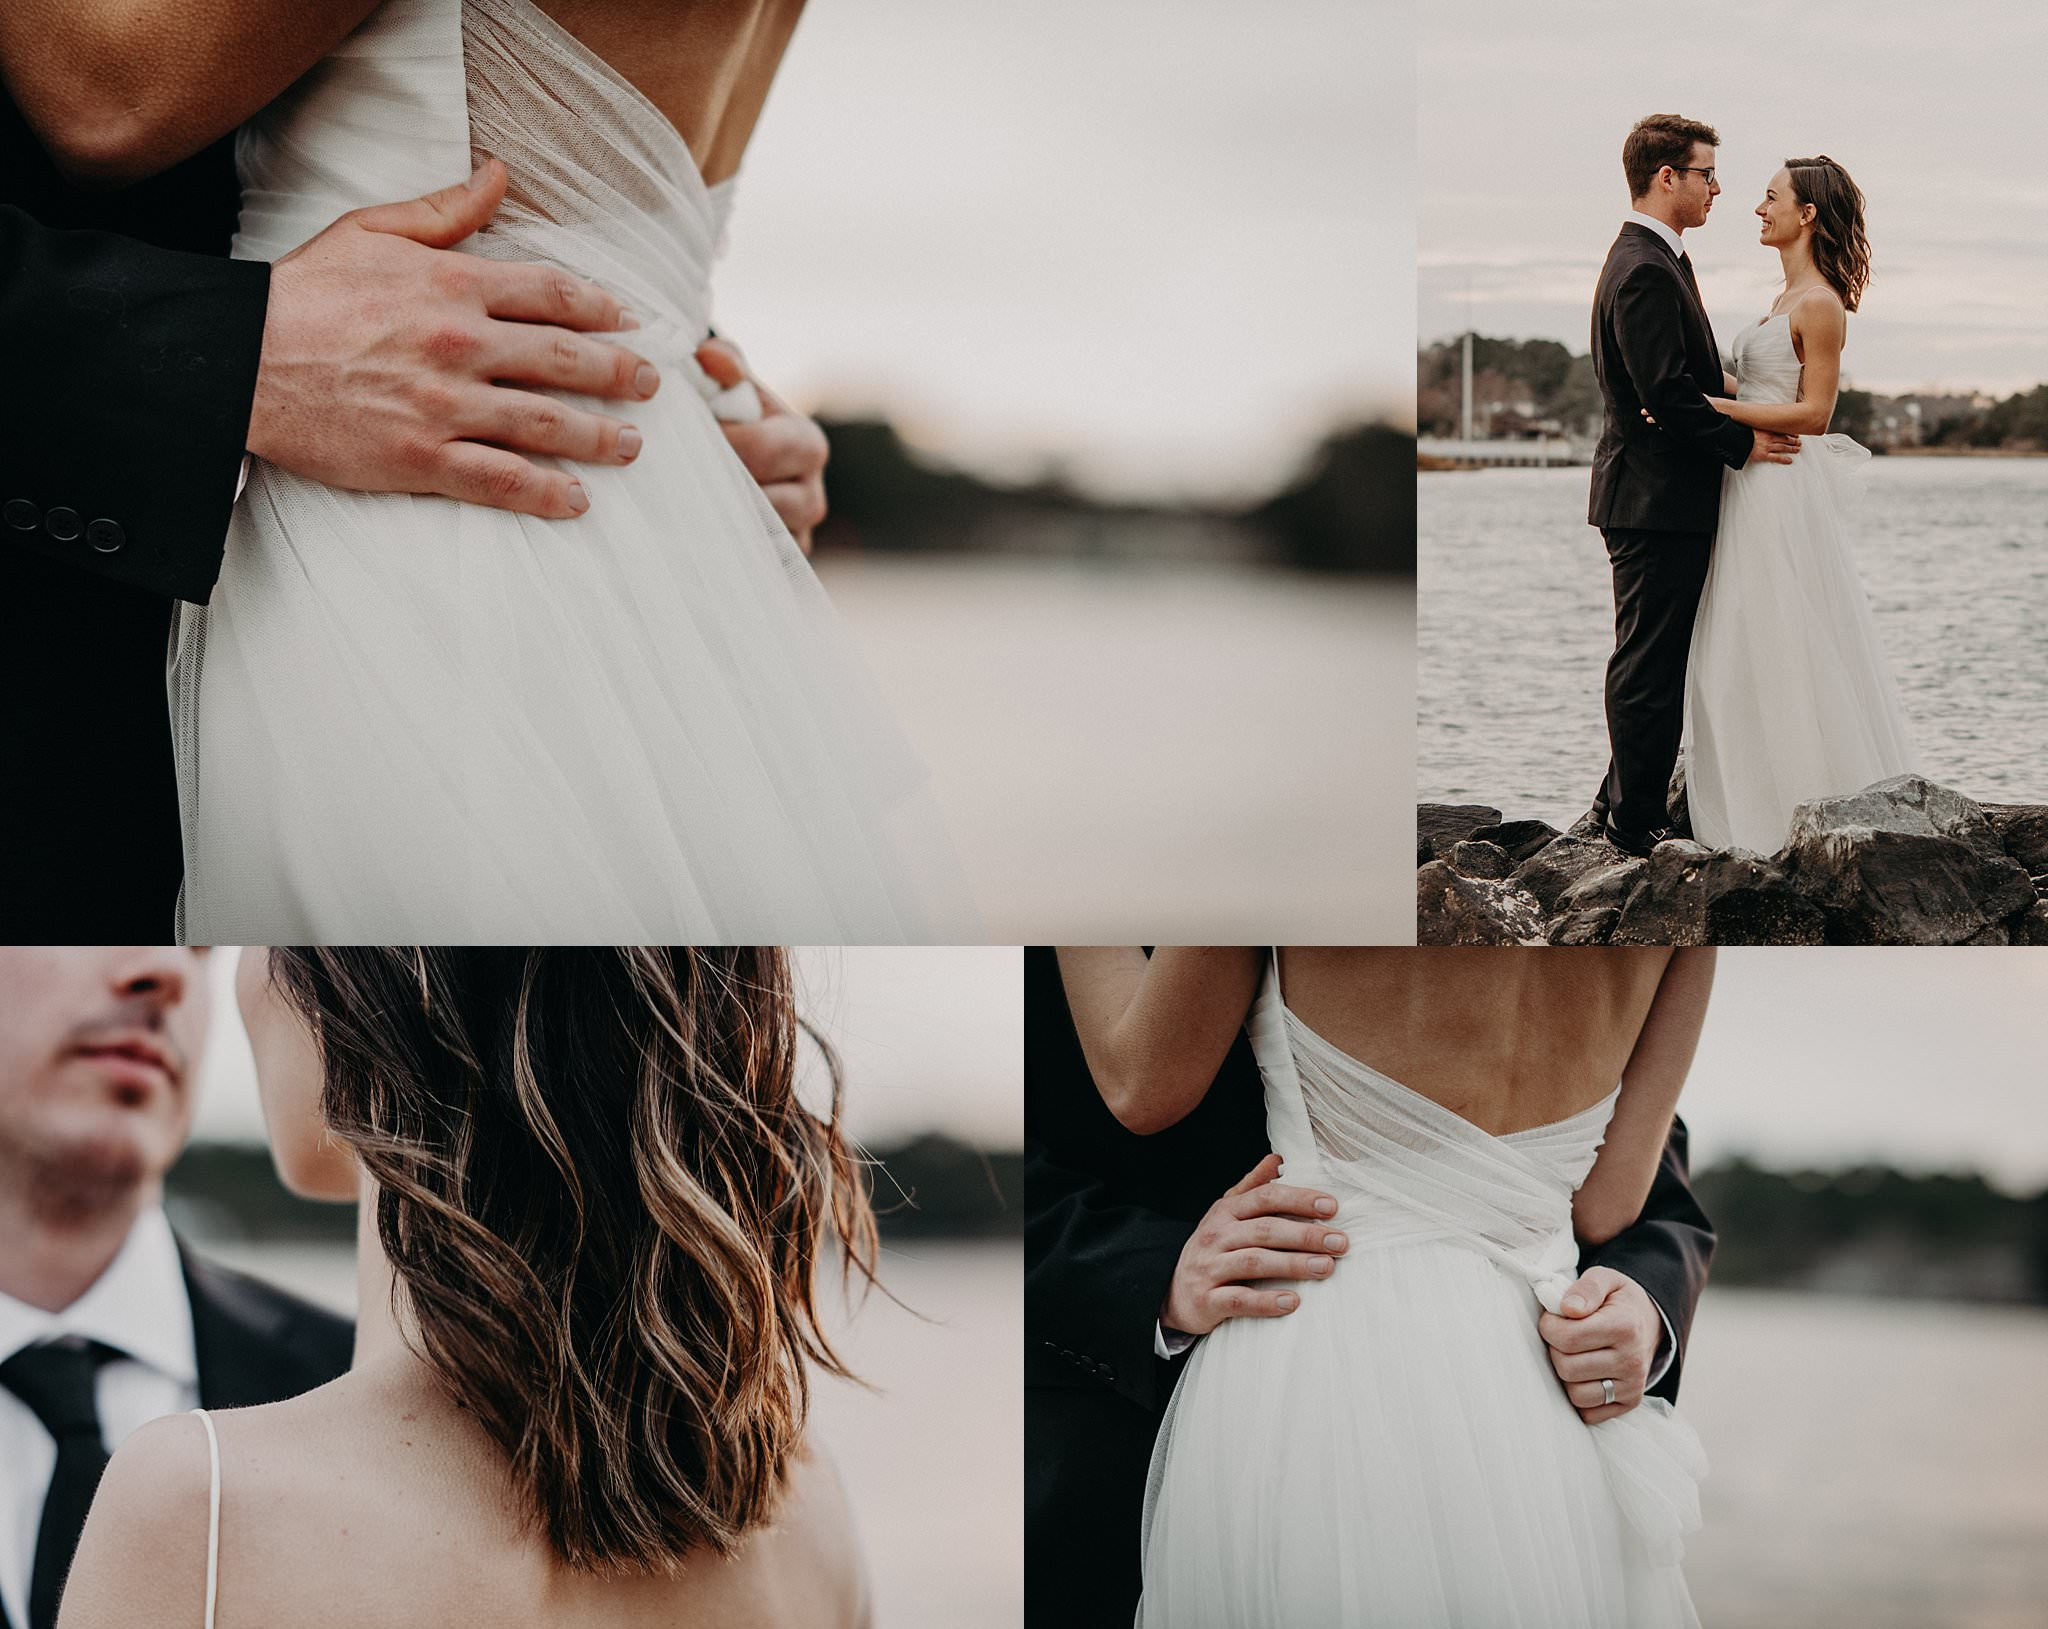 Beach-engagement-photos-by-norfolk-wedding-photographer-melissa-bliss-photography-VA-NC-Photographer.jpg